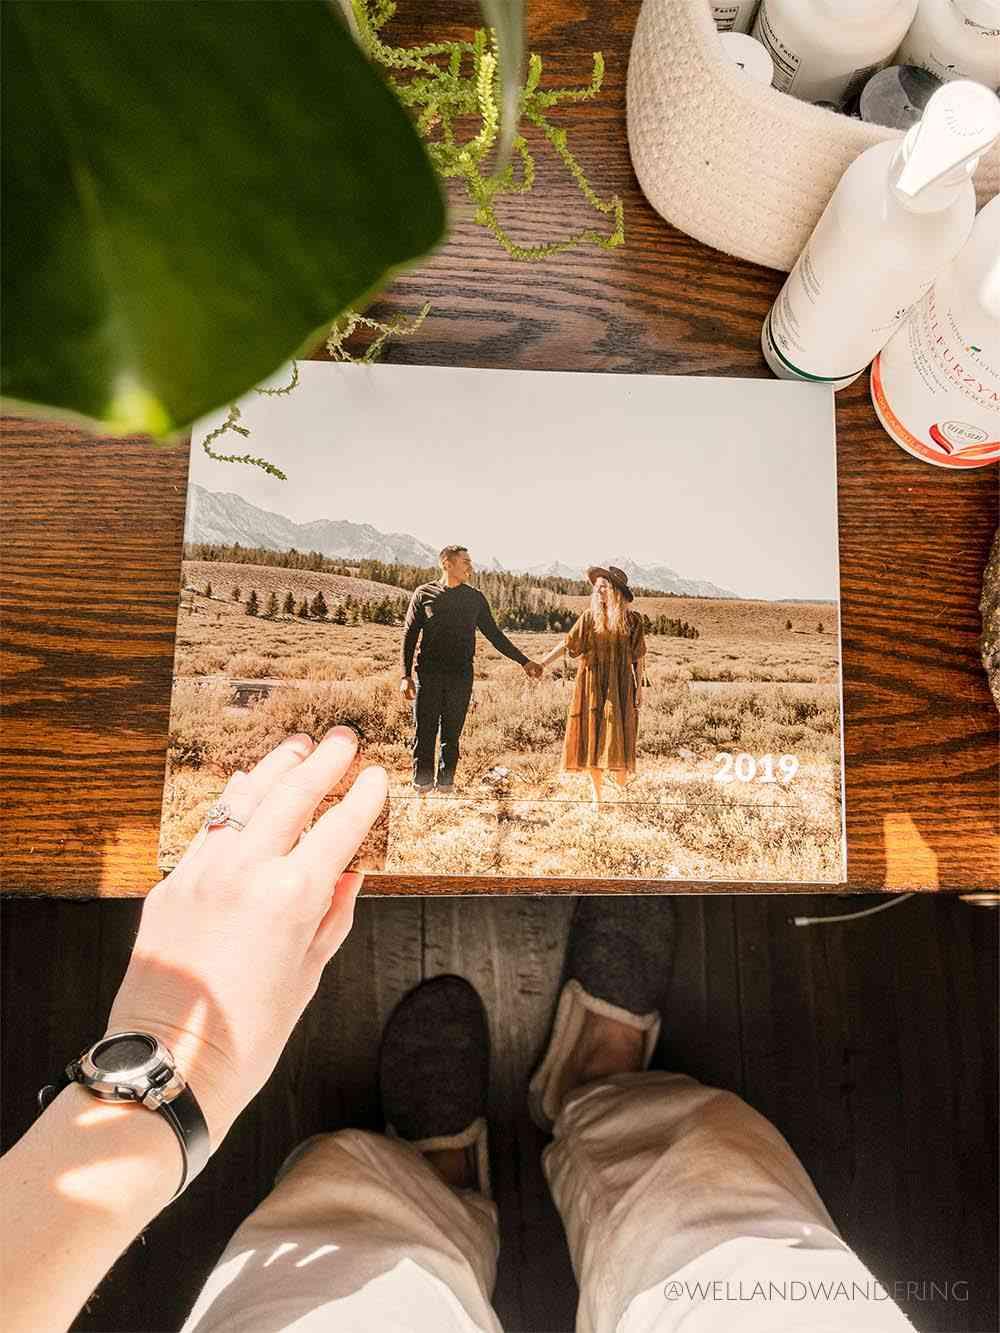 Mimeo Photos delivers photo goods worldwide